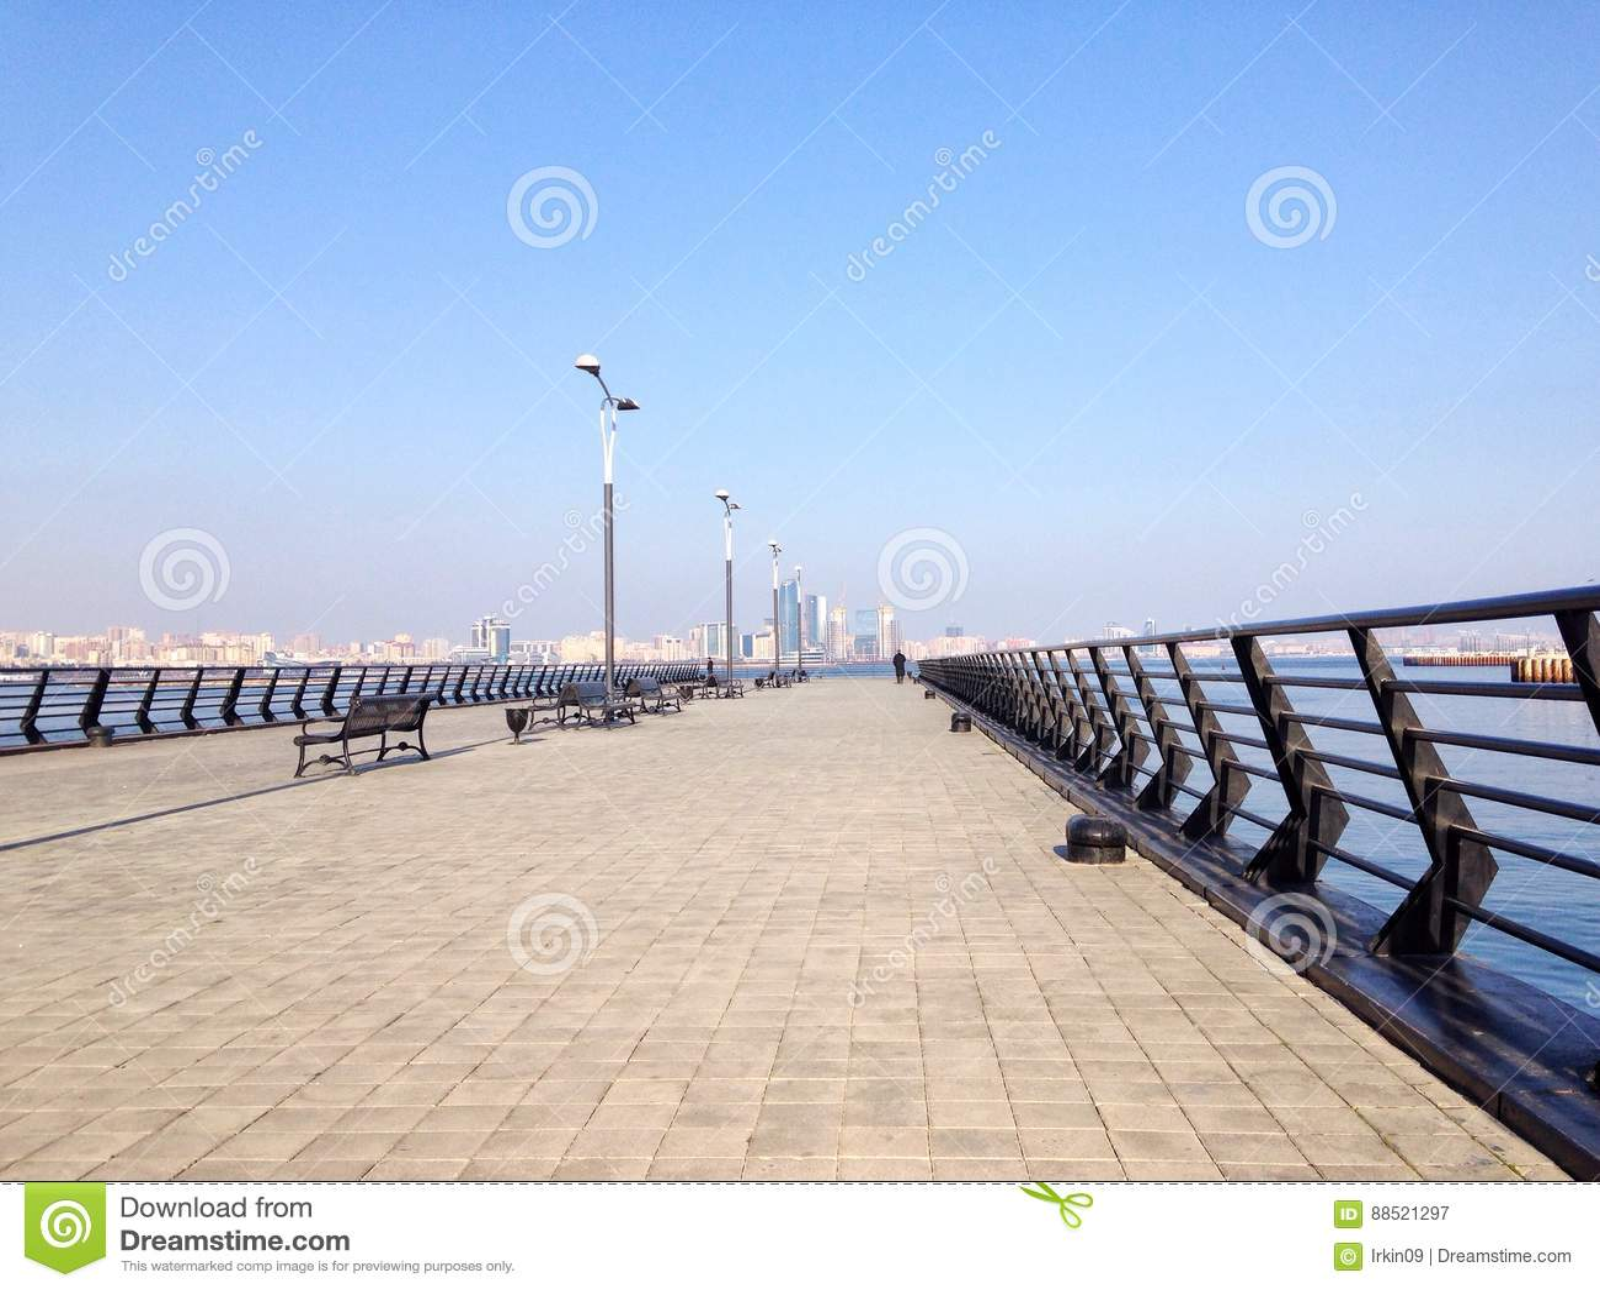 Pier at the Caspian Sea